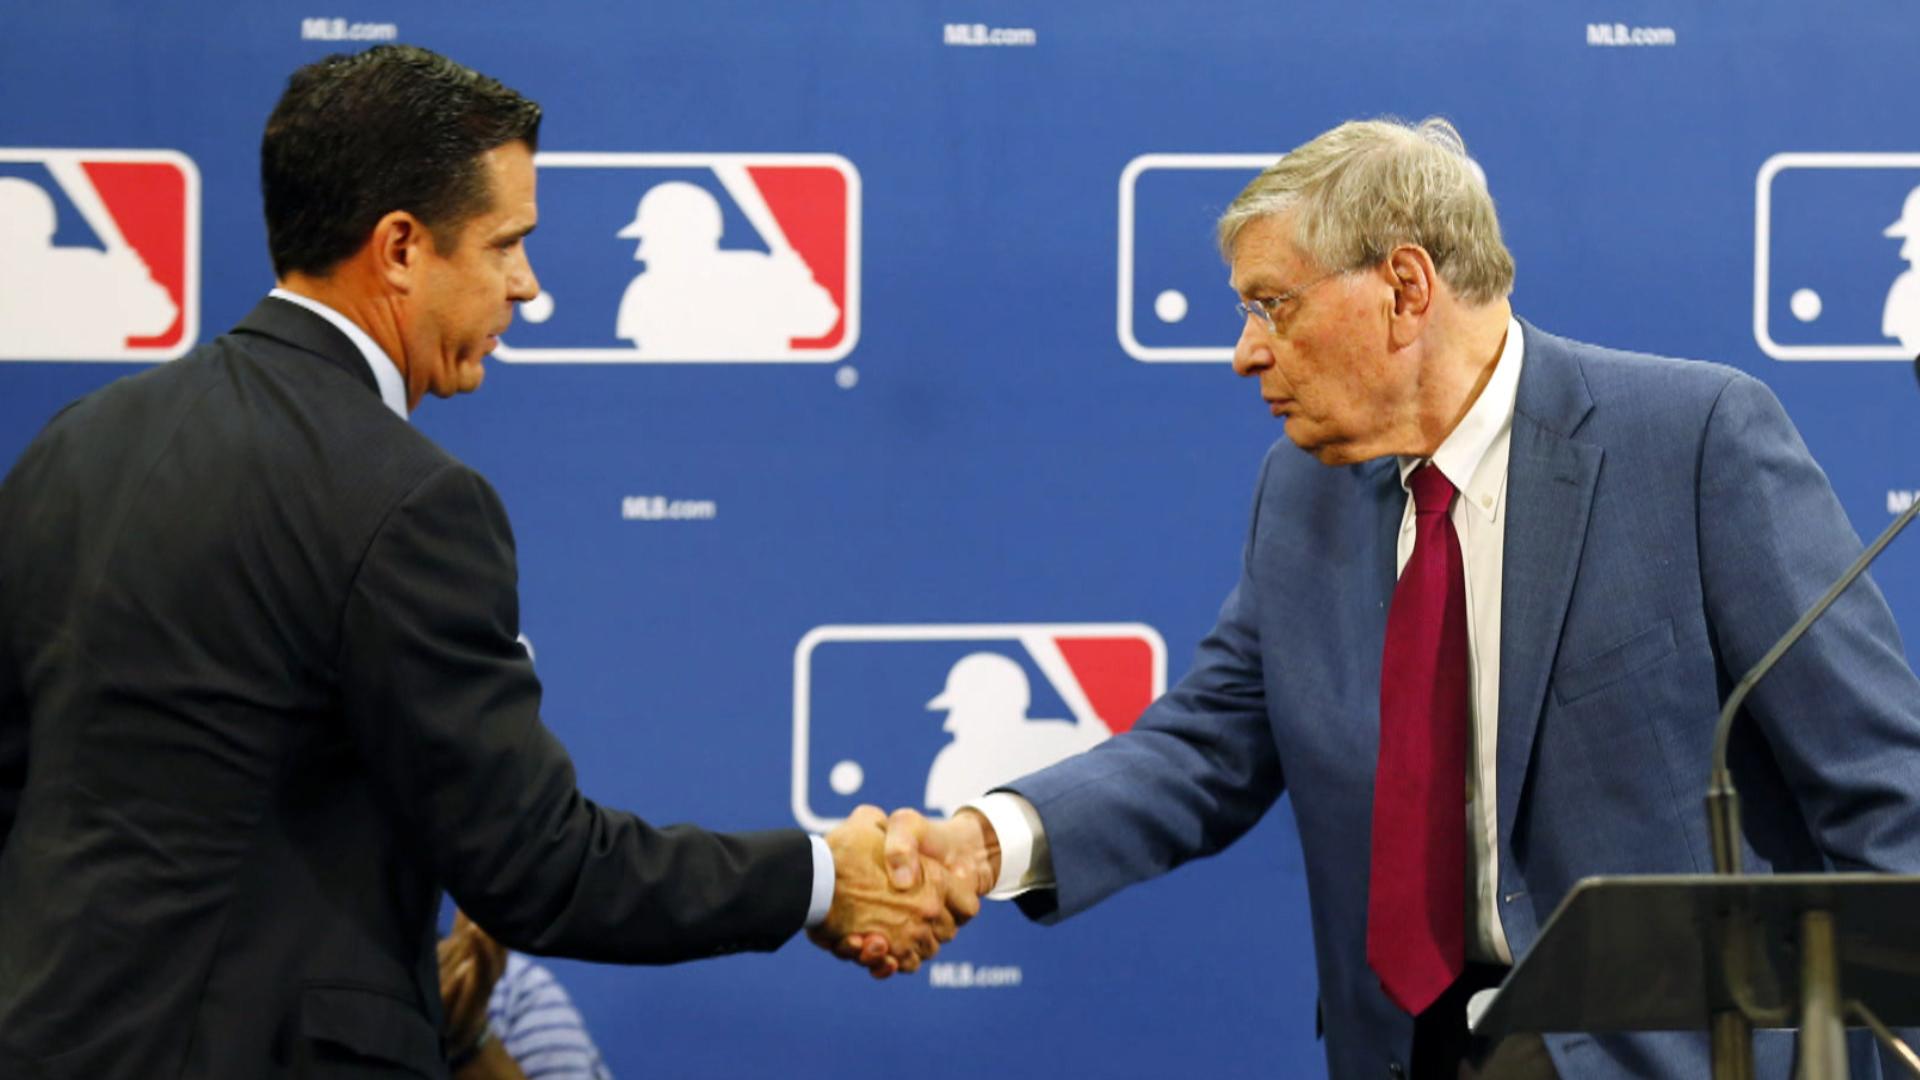 MLB moves forward on LGBT inclusion